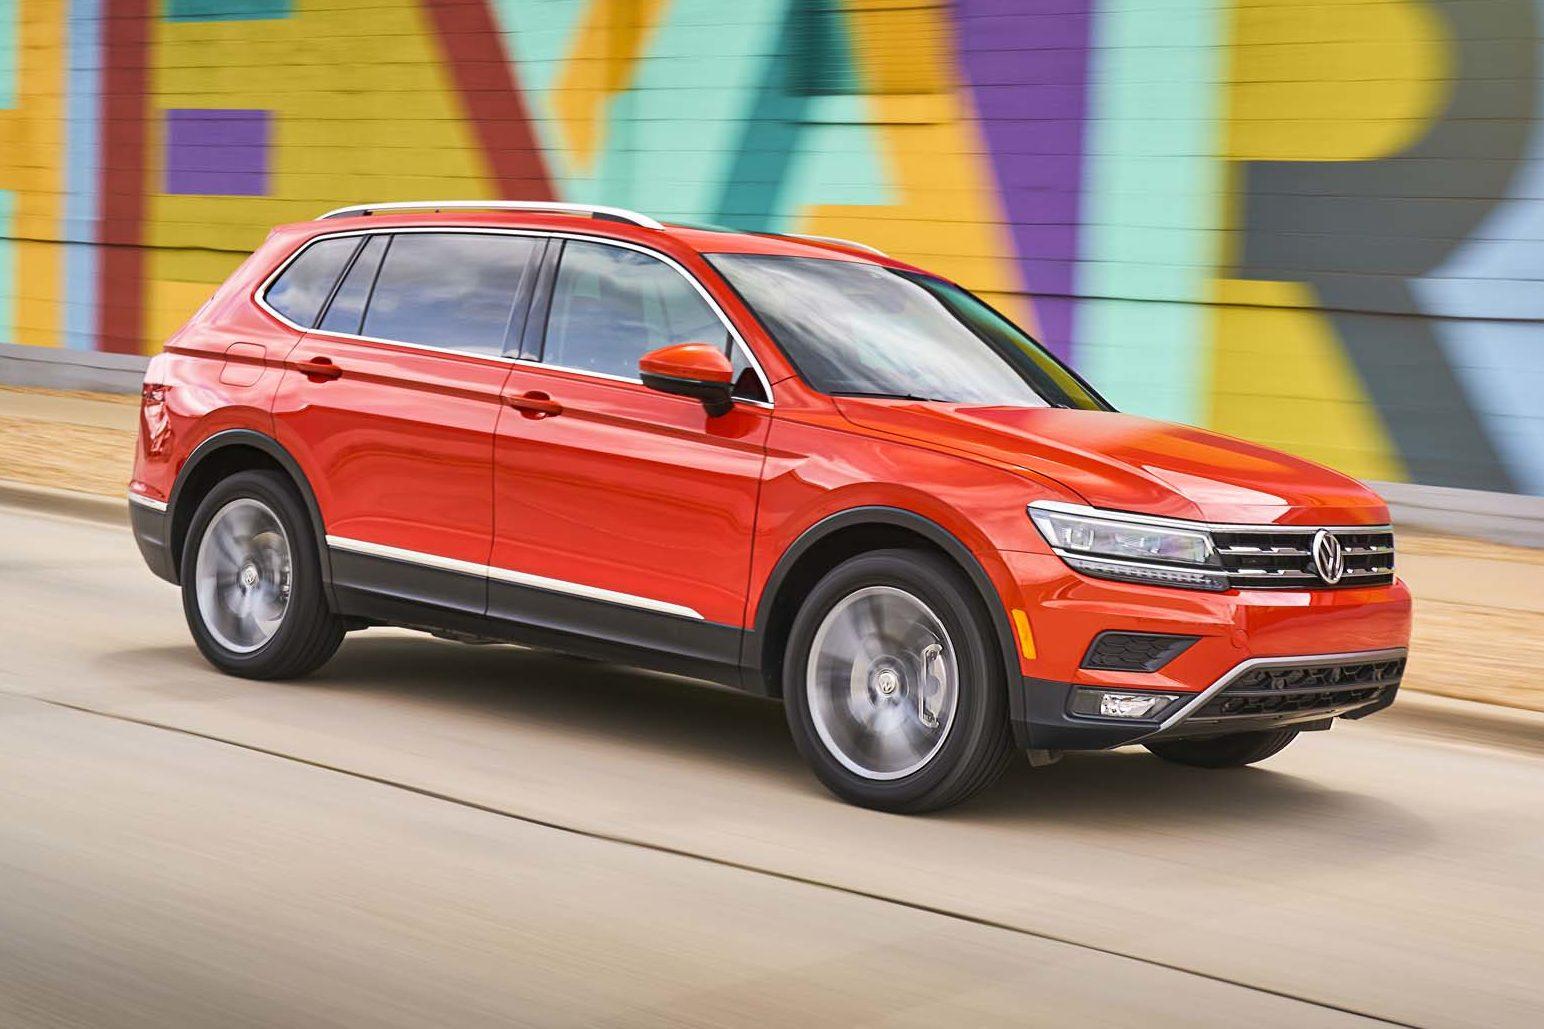 2018 Volkswagen Tiguan SEL Premium Front Side In Motion E1498504893700